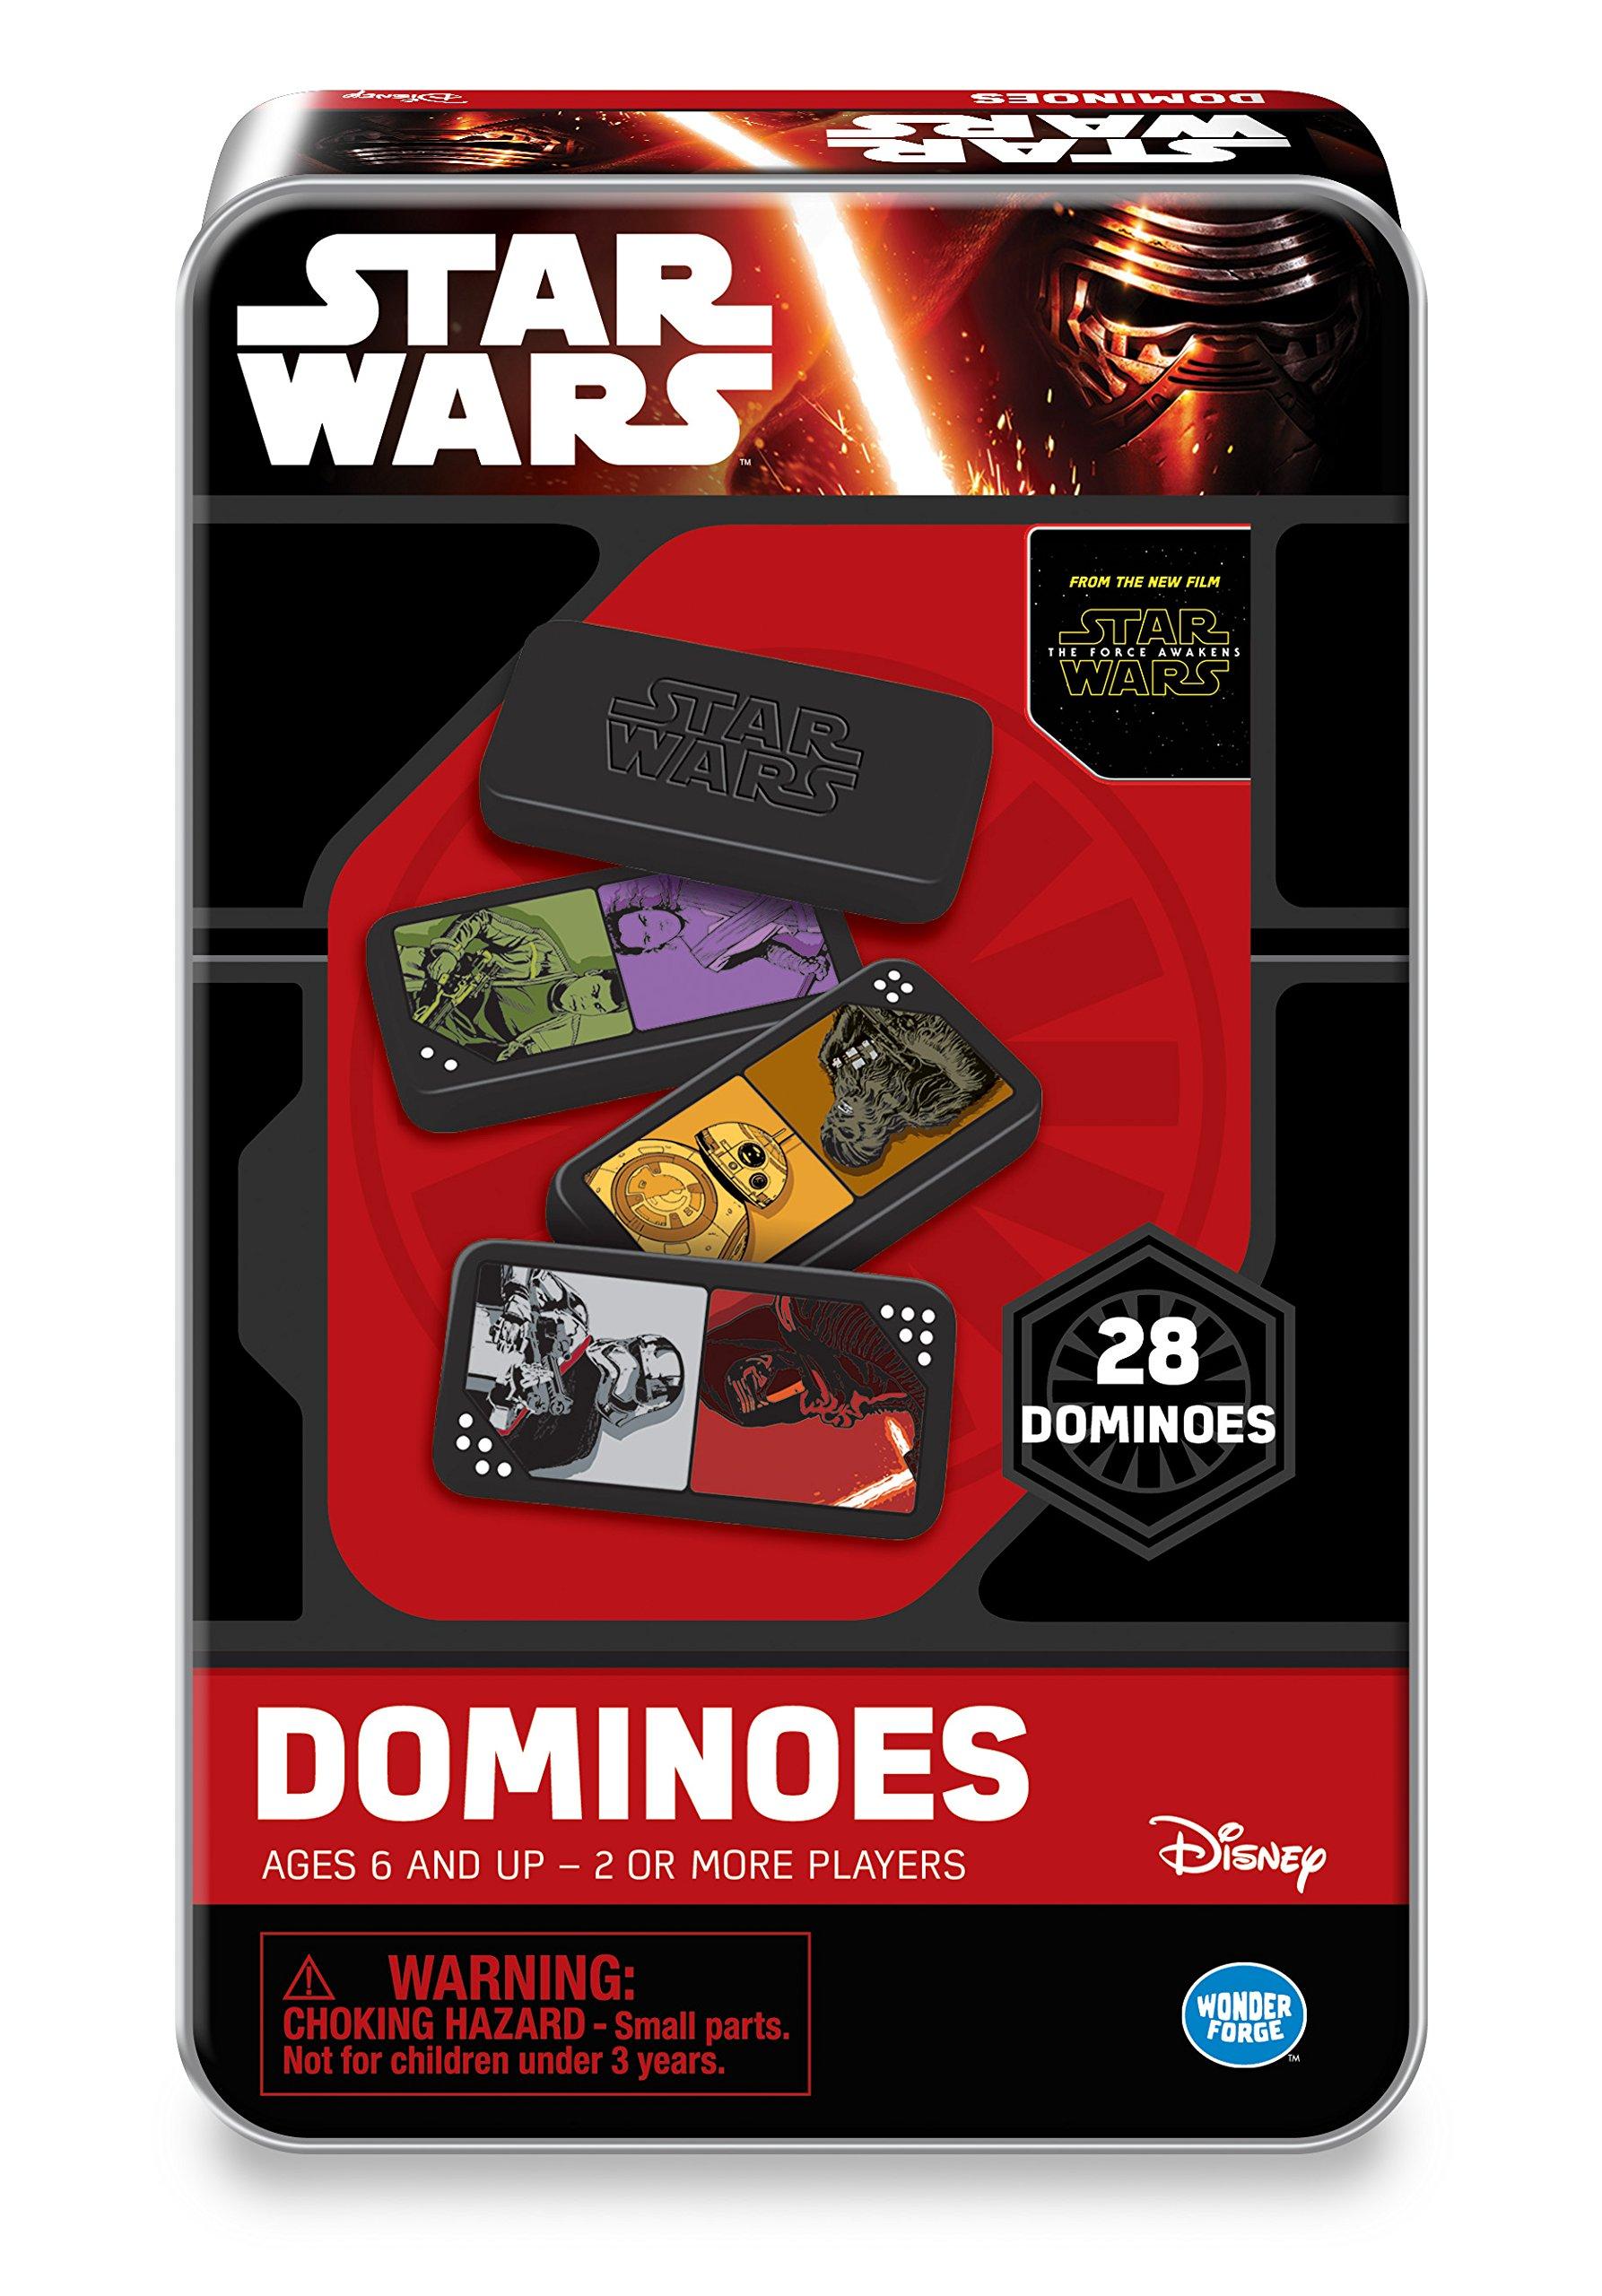 Star Wars Dominoes: The Force Awakens Board Game